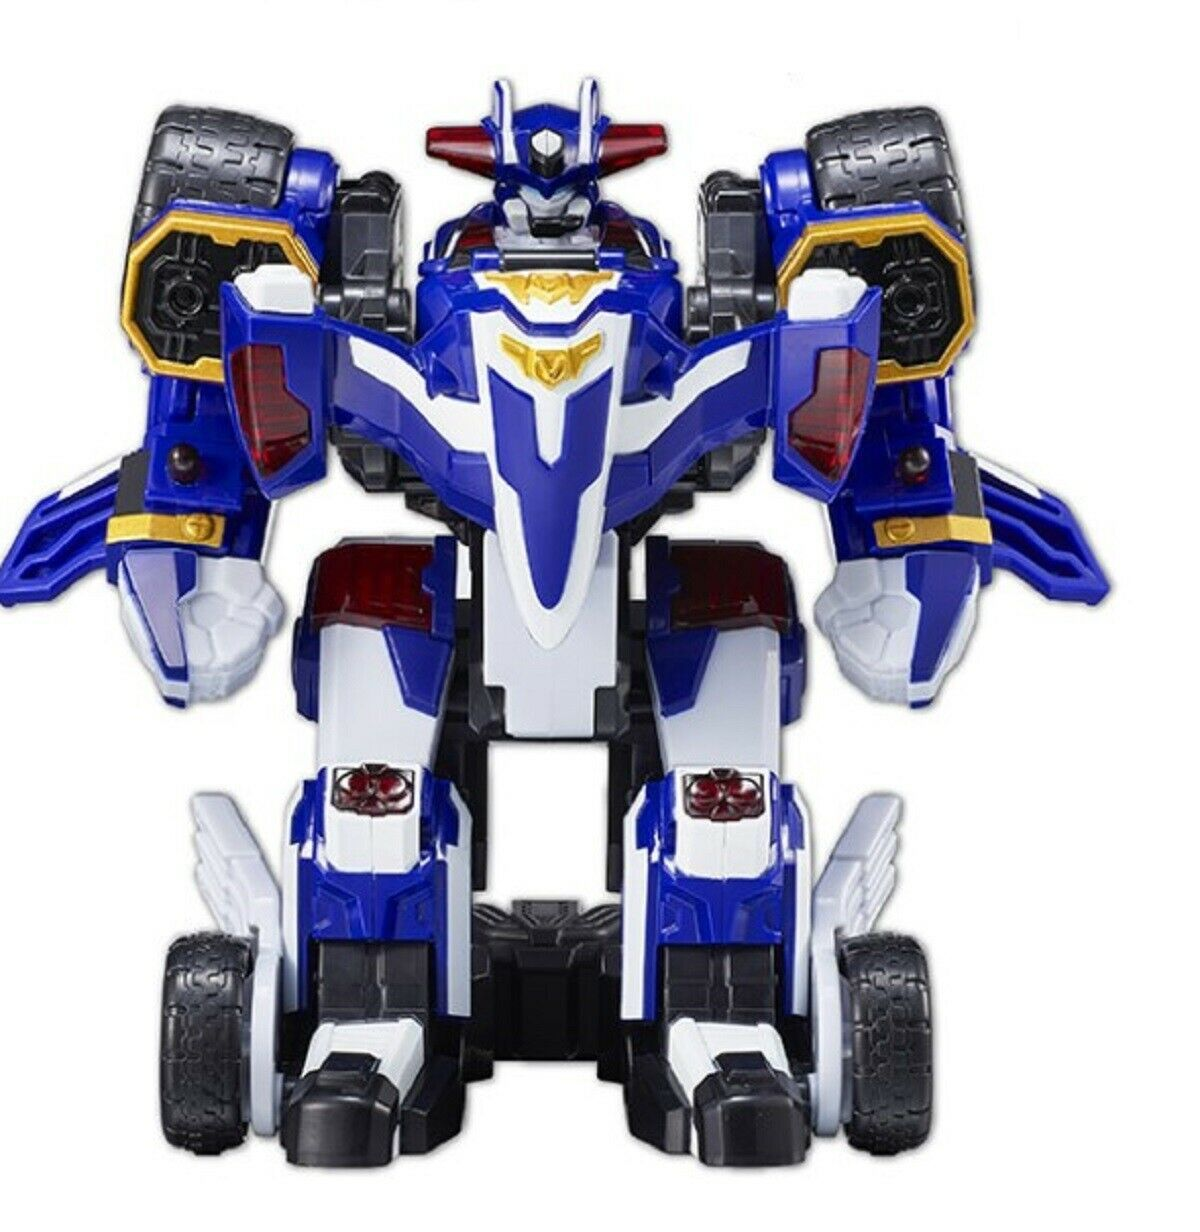 Tobot V Grand Storm Joe Transformation Action Figure Toy